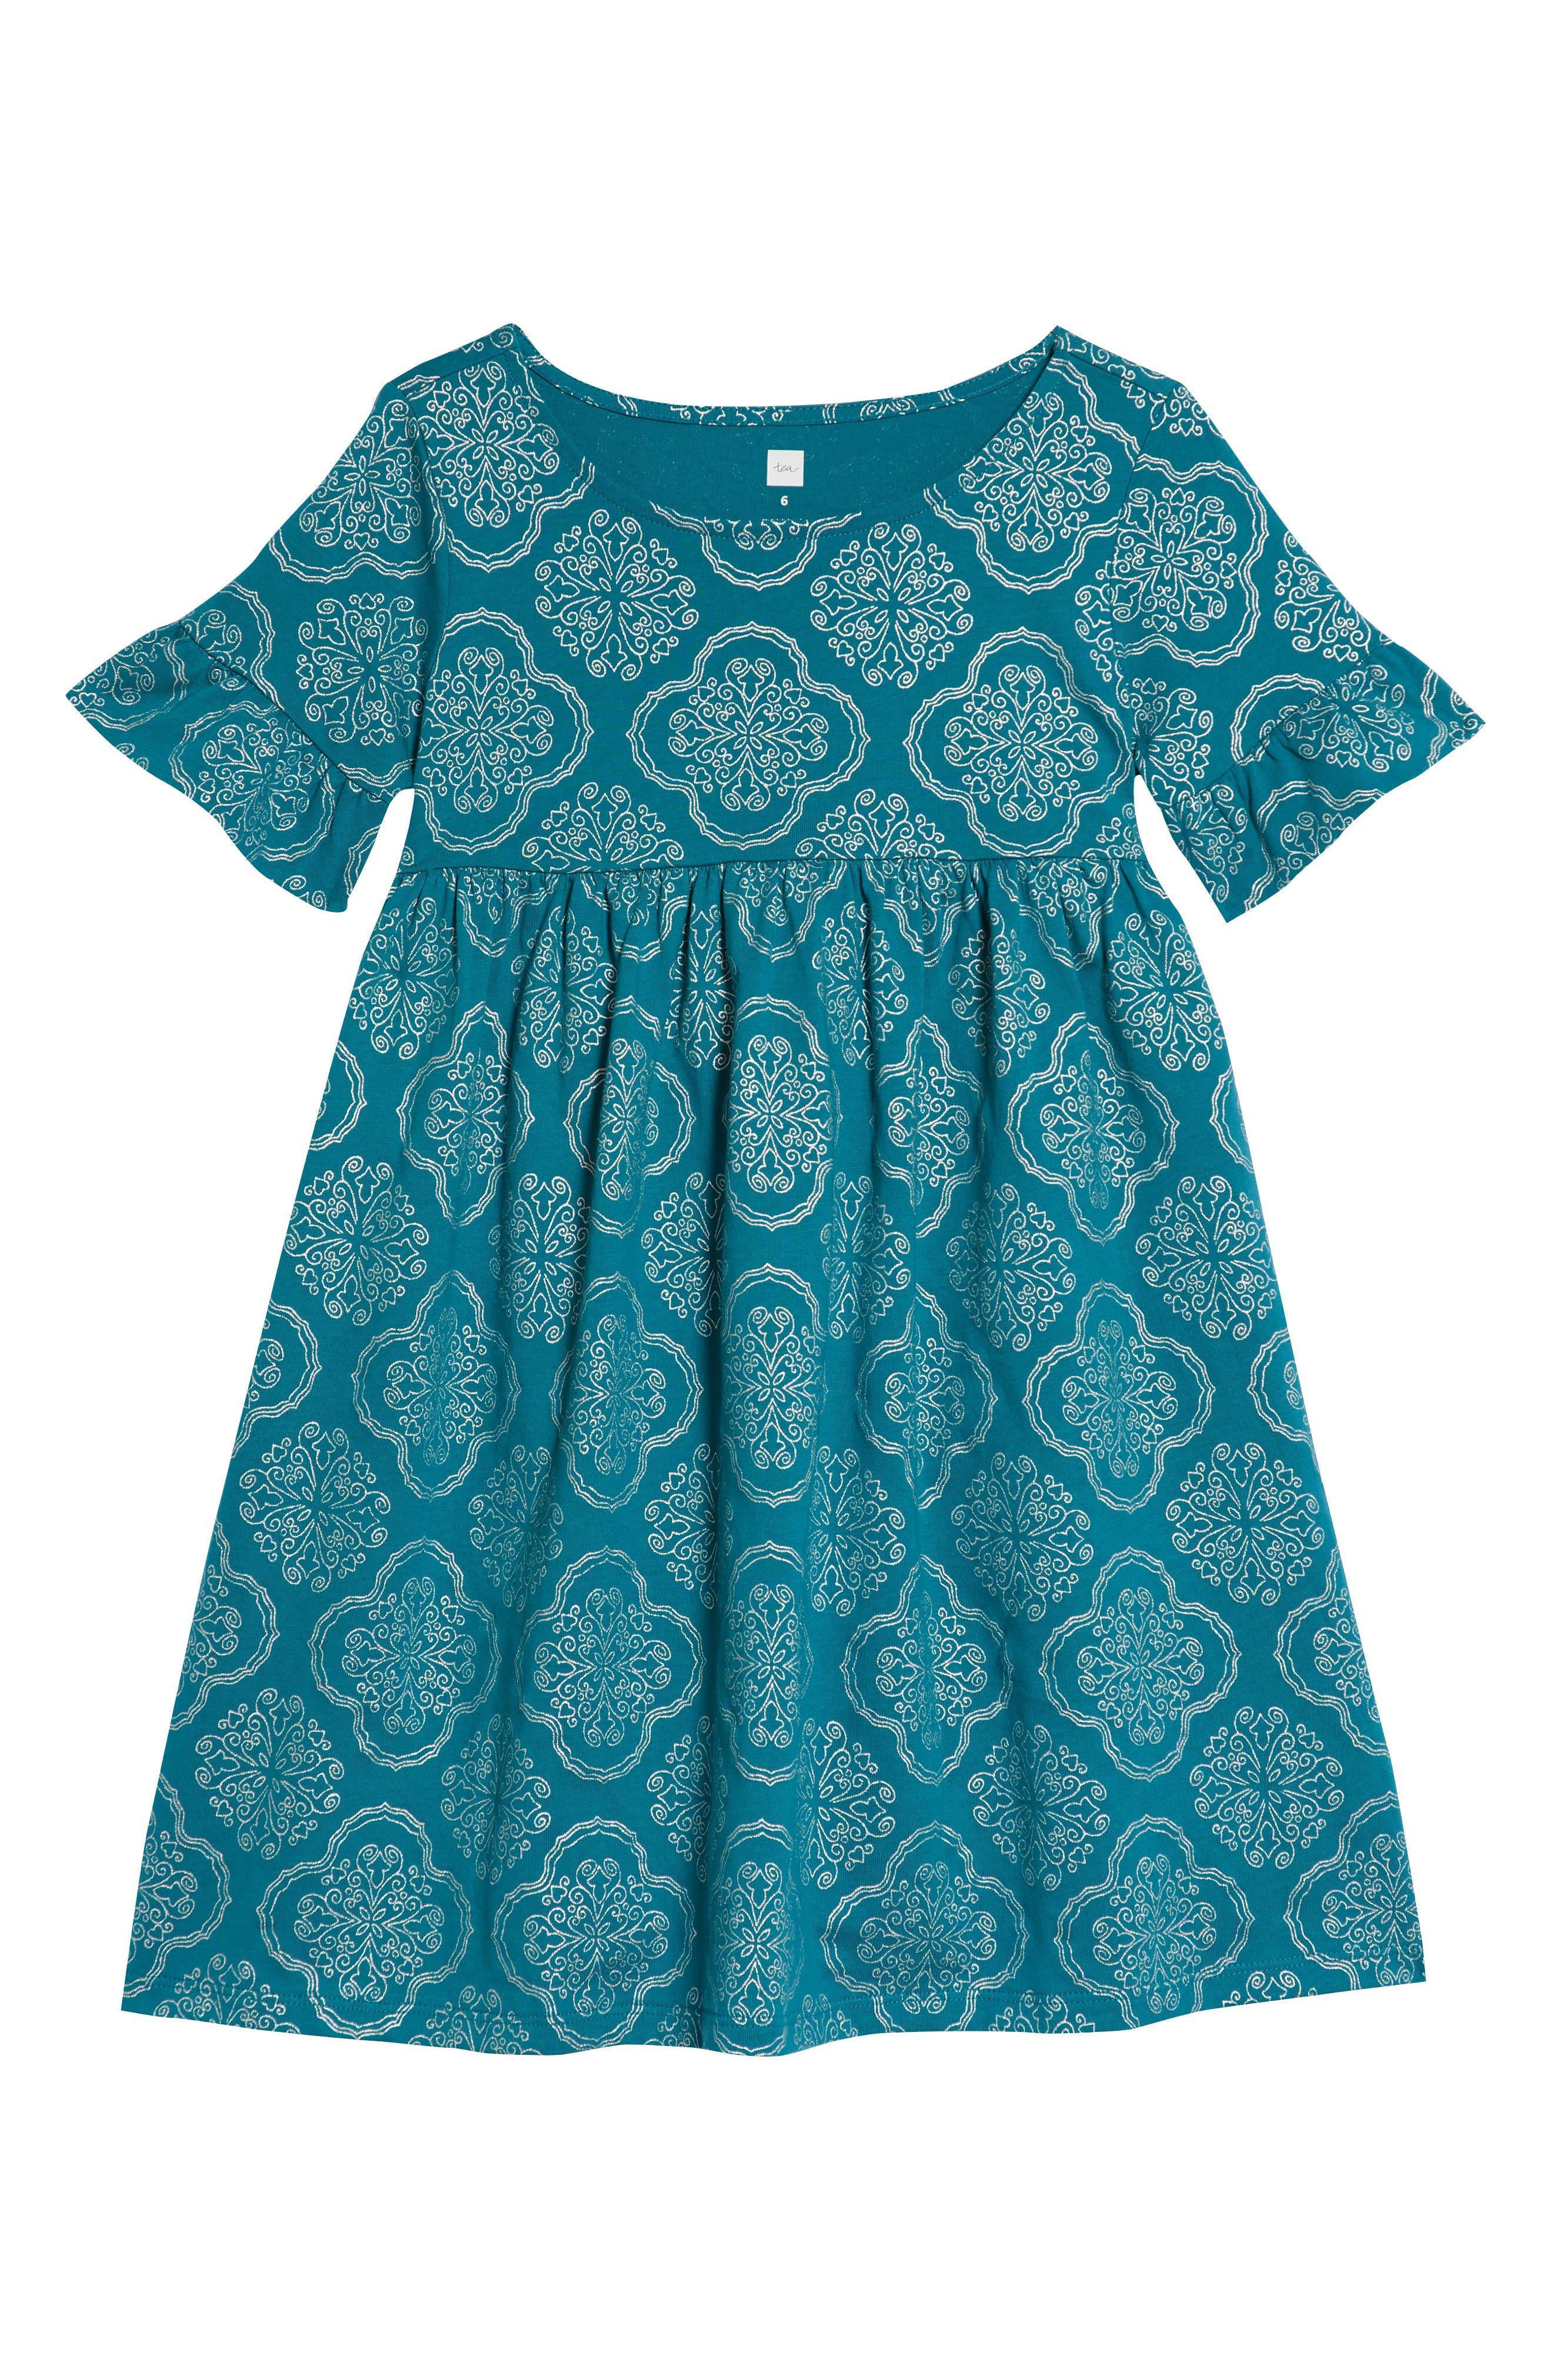 Ruffle Sleeve Dress,                         Main,                         color, New Orleans Tile